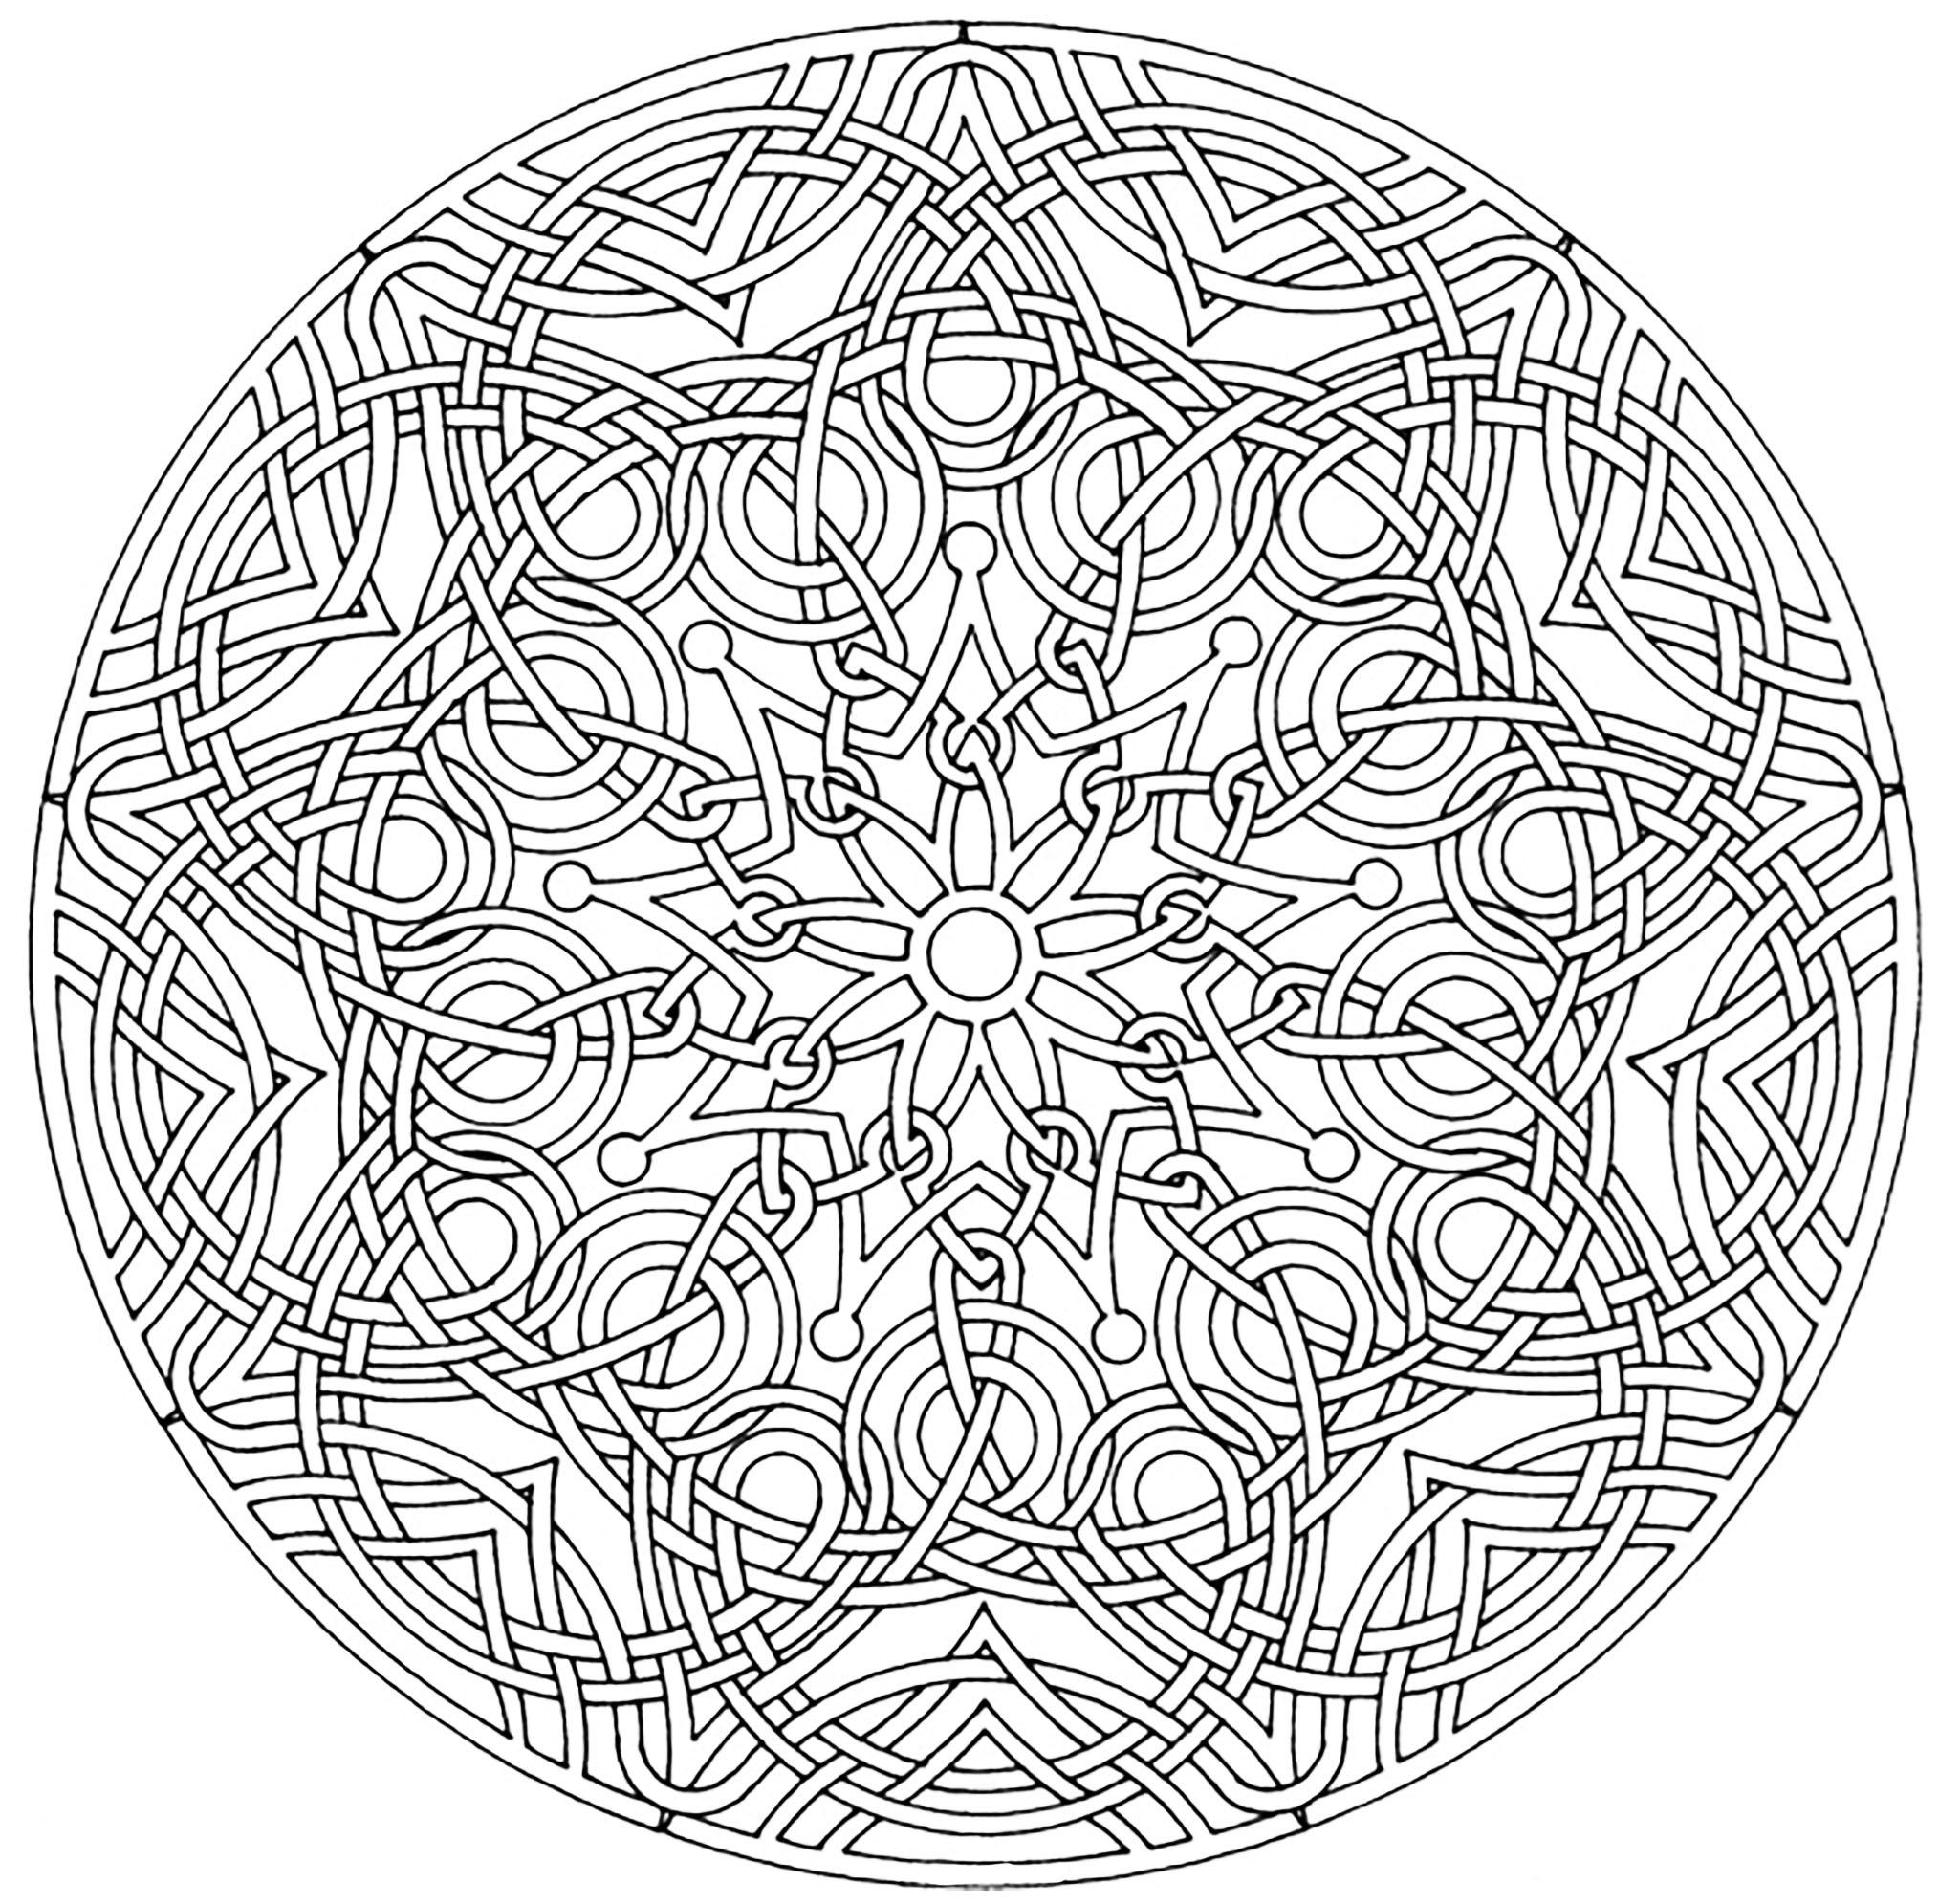 Mandala coloring pages for seniors - Royal Mandala From The Gallery Mandalas